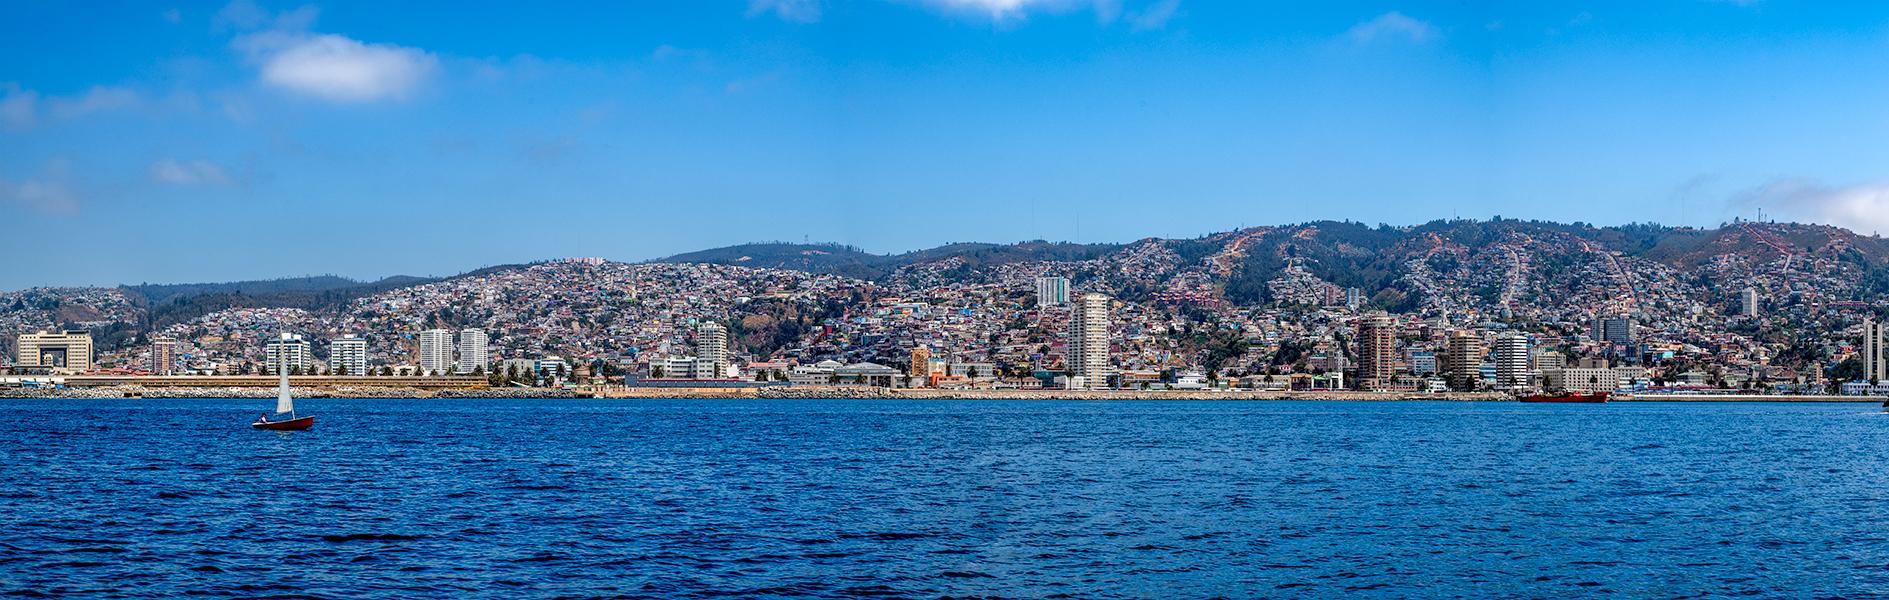 Valparaiso Bay, Chile